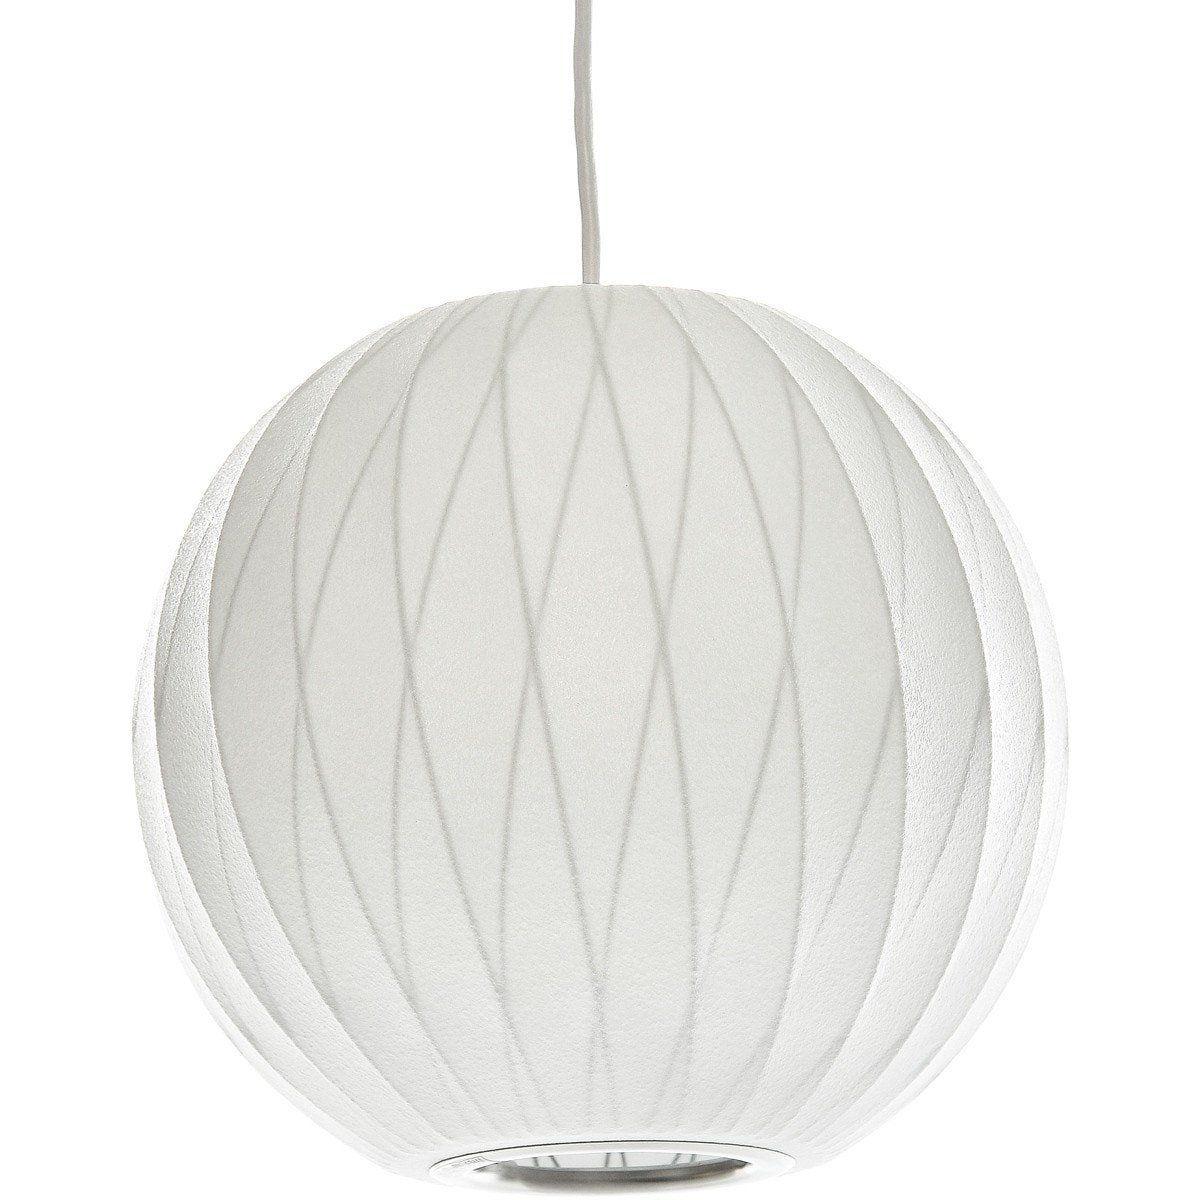 Replica Nelson Bubble Lamp Ball Pendant Light White